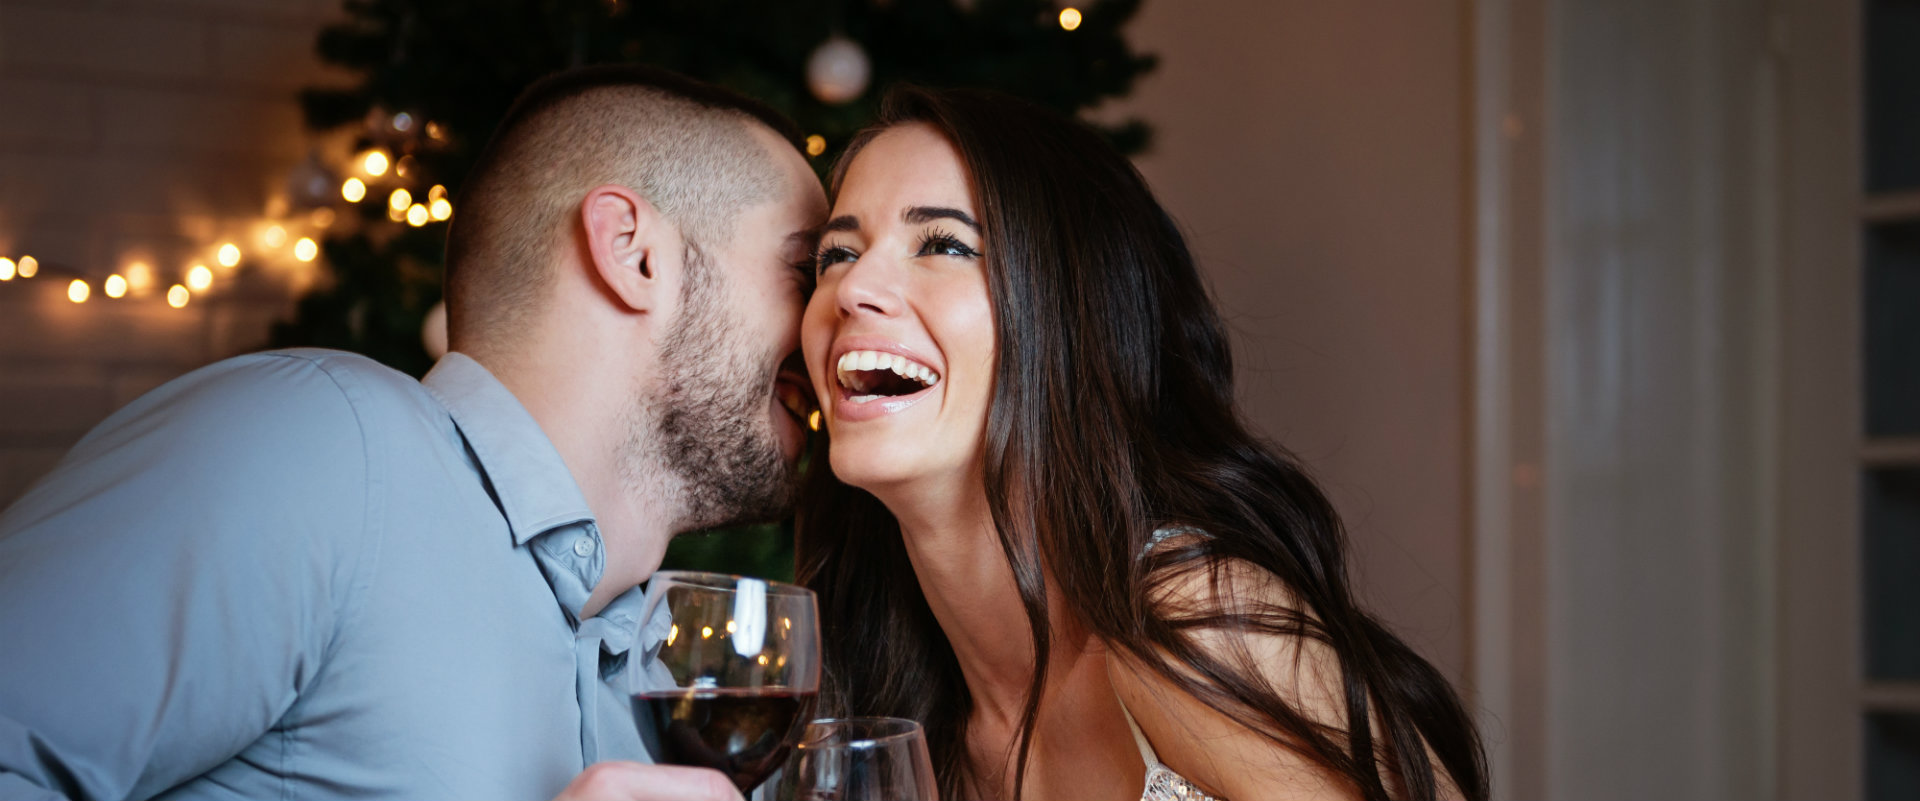 7 alimentos afrodisíacos para disfrutar con tu pareja